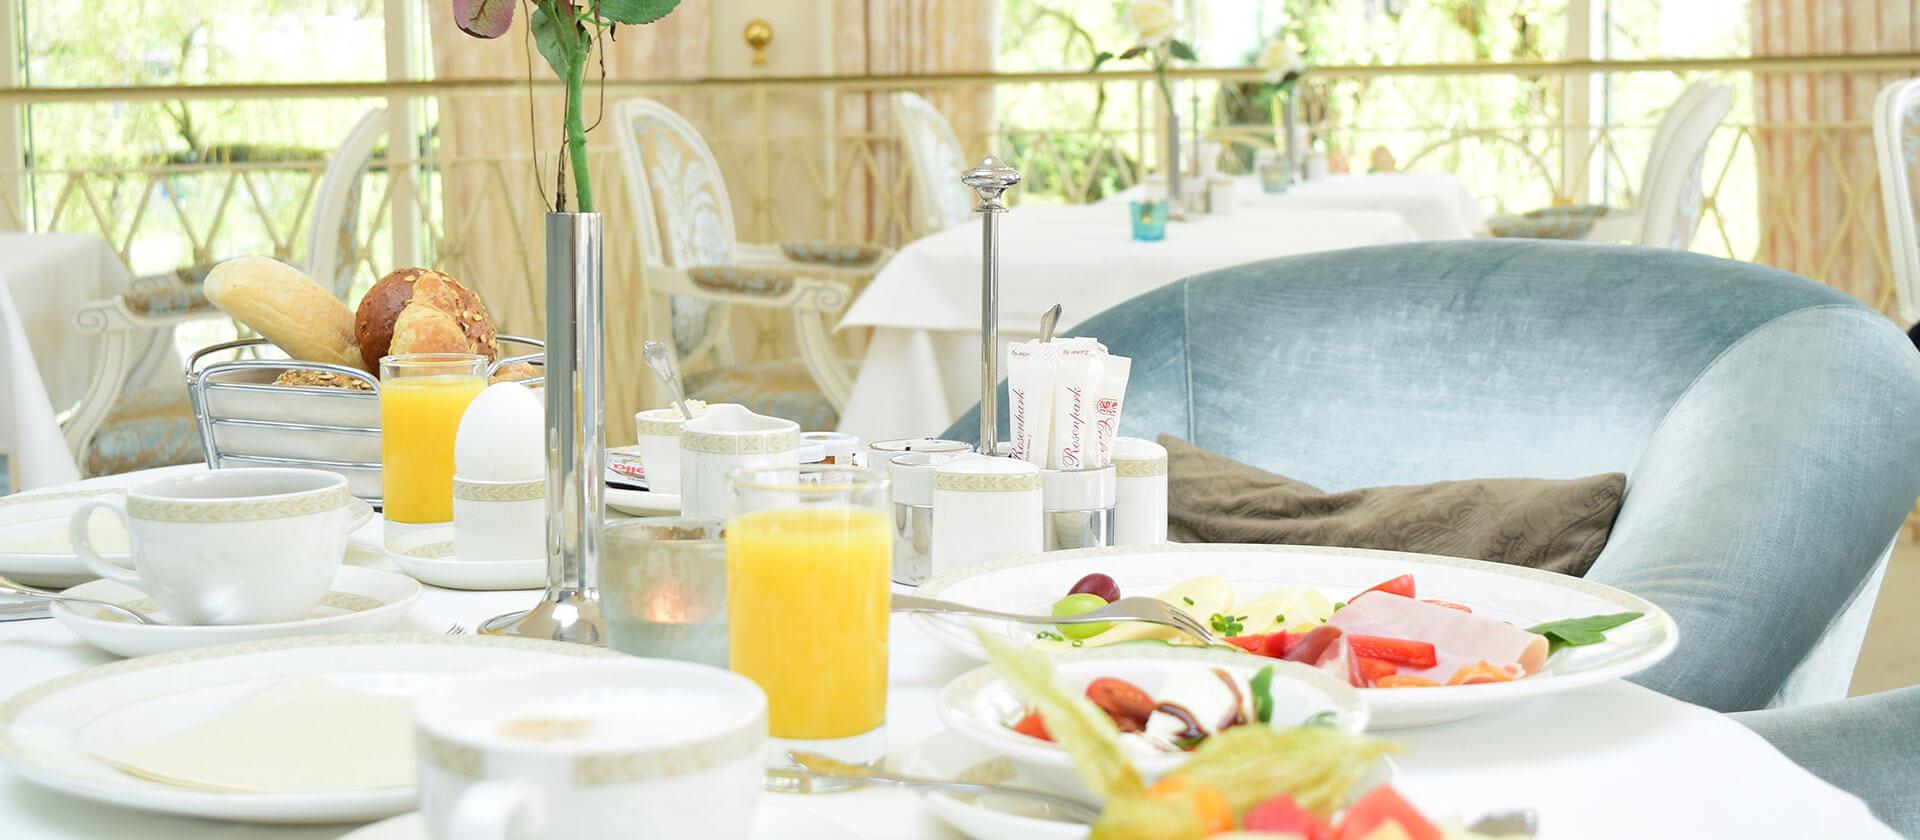 Gedeckter Frühstückstisch im Café Rosenpark